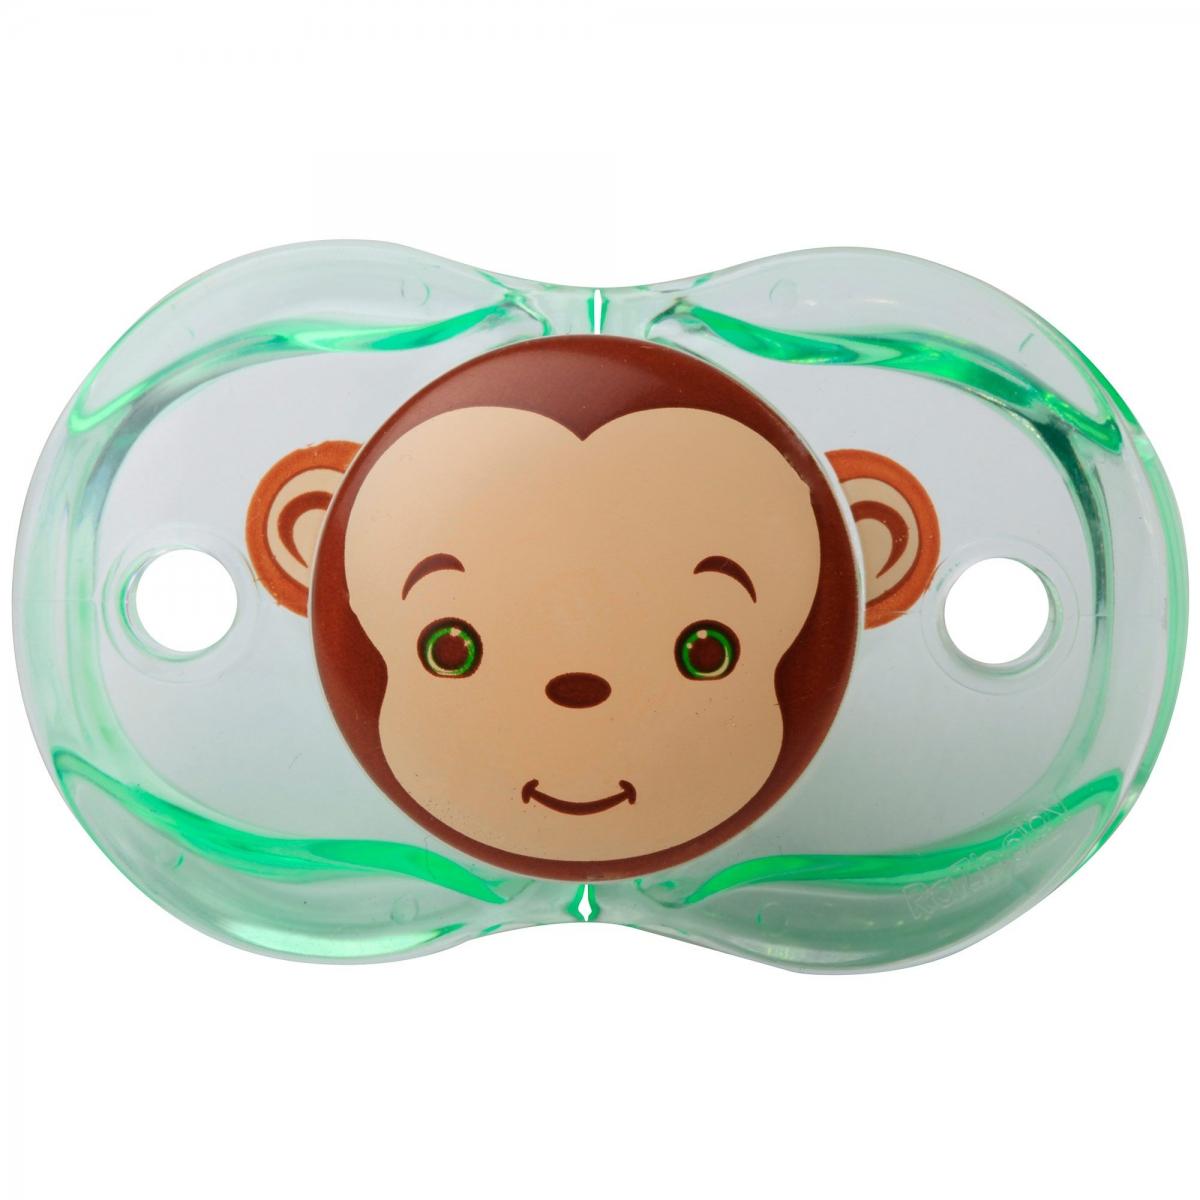 RaZBaby Keep It Kleen Pacifier Monkey